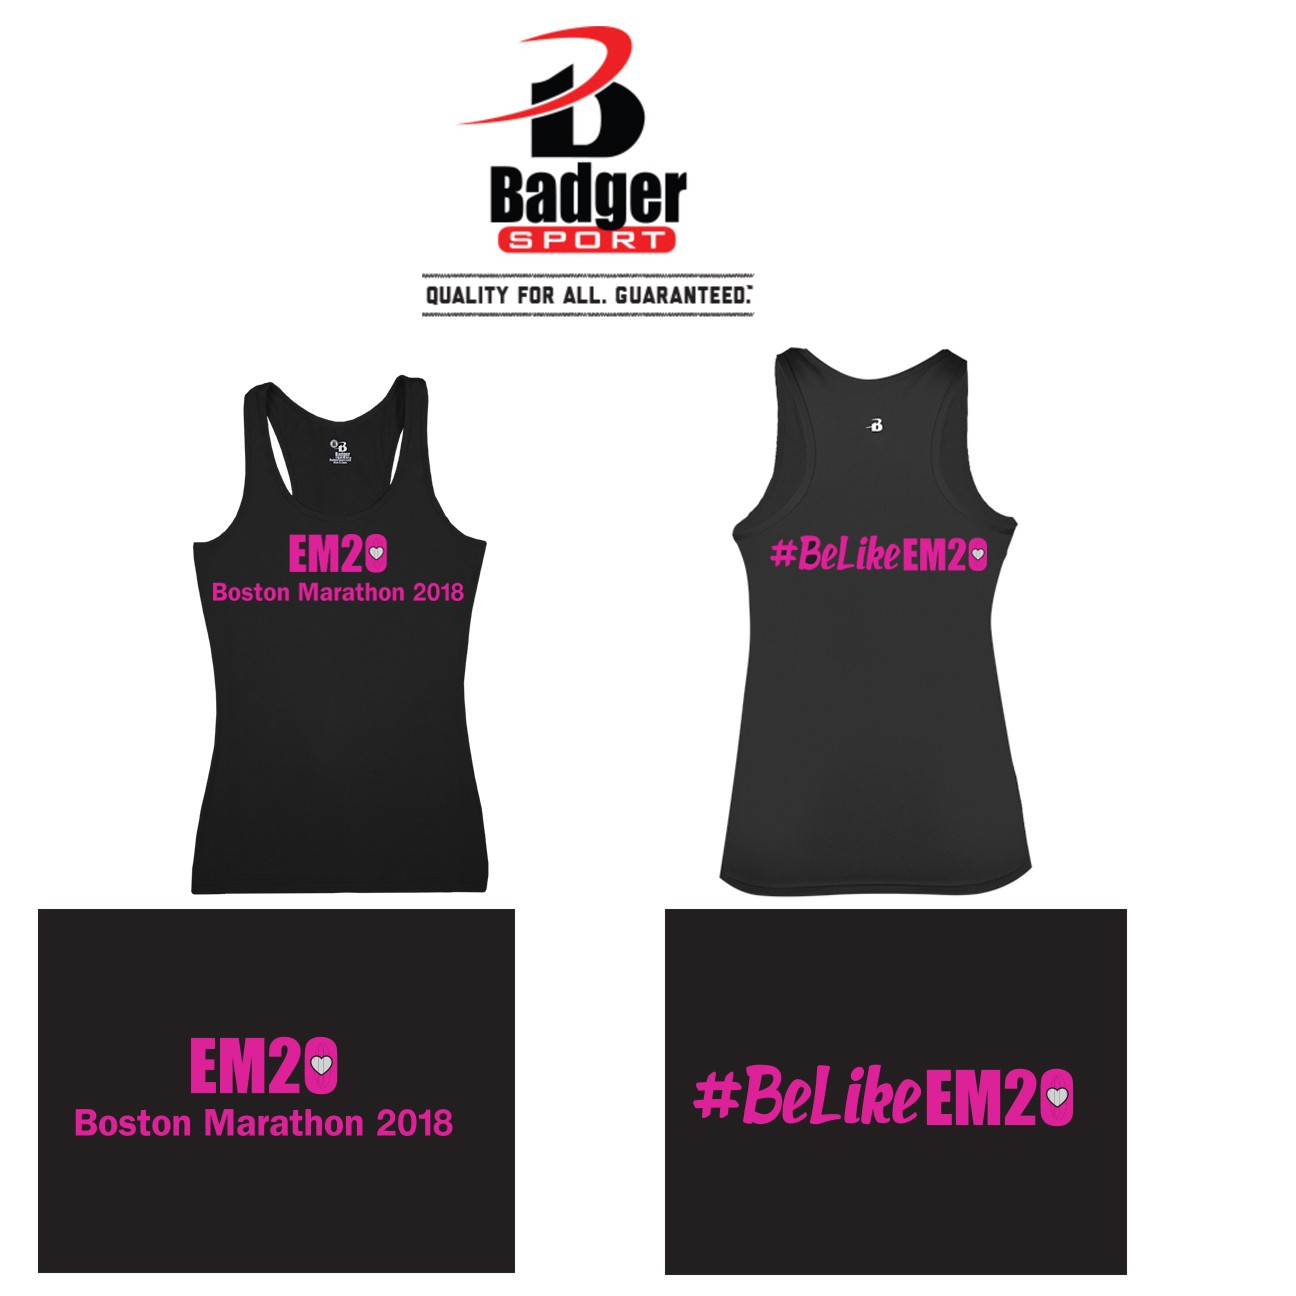 Emma Ryan Scholarship Fund Badger Brand Pro Compression Women's Racerback, Performance, Women's. Compression (Snug/Fitted), SPECIAL EDITION BOSTON MARATHON 2018